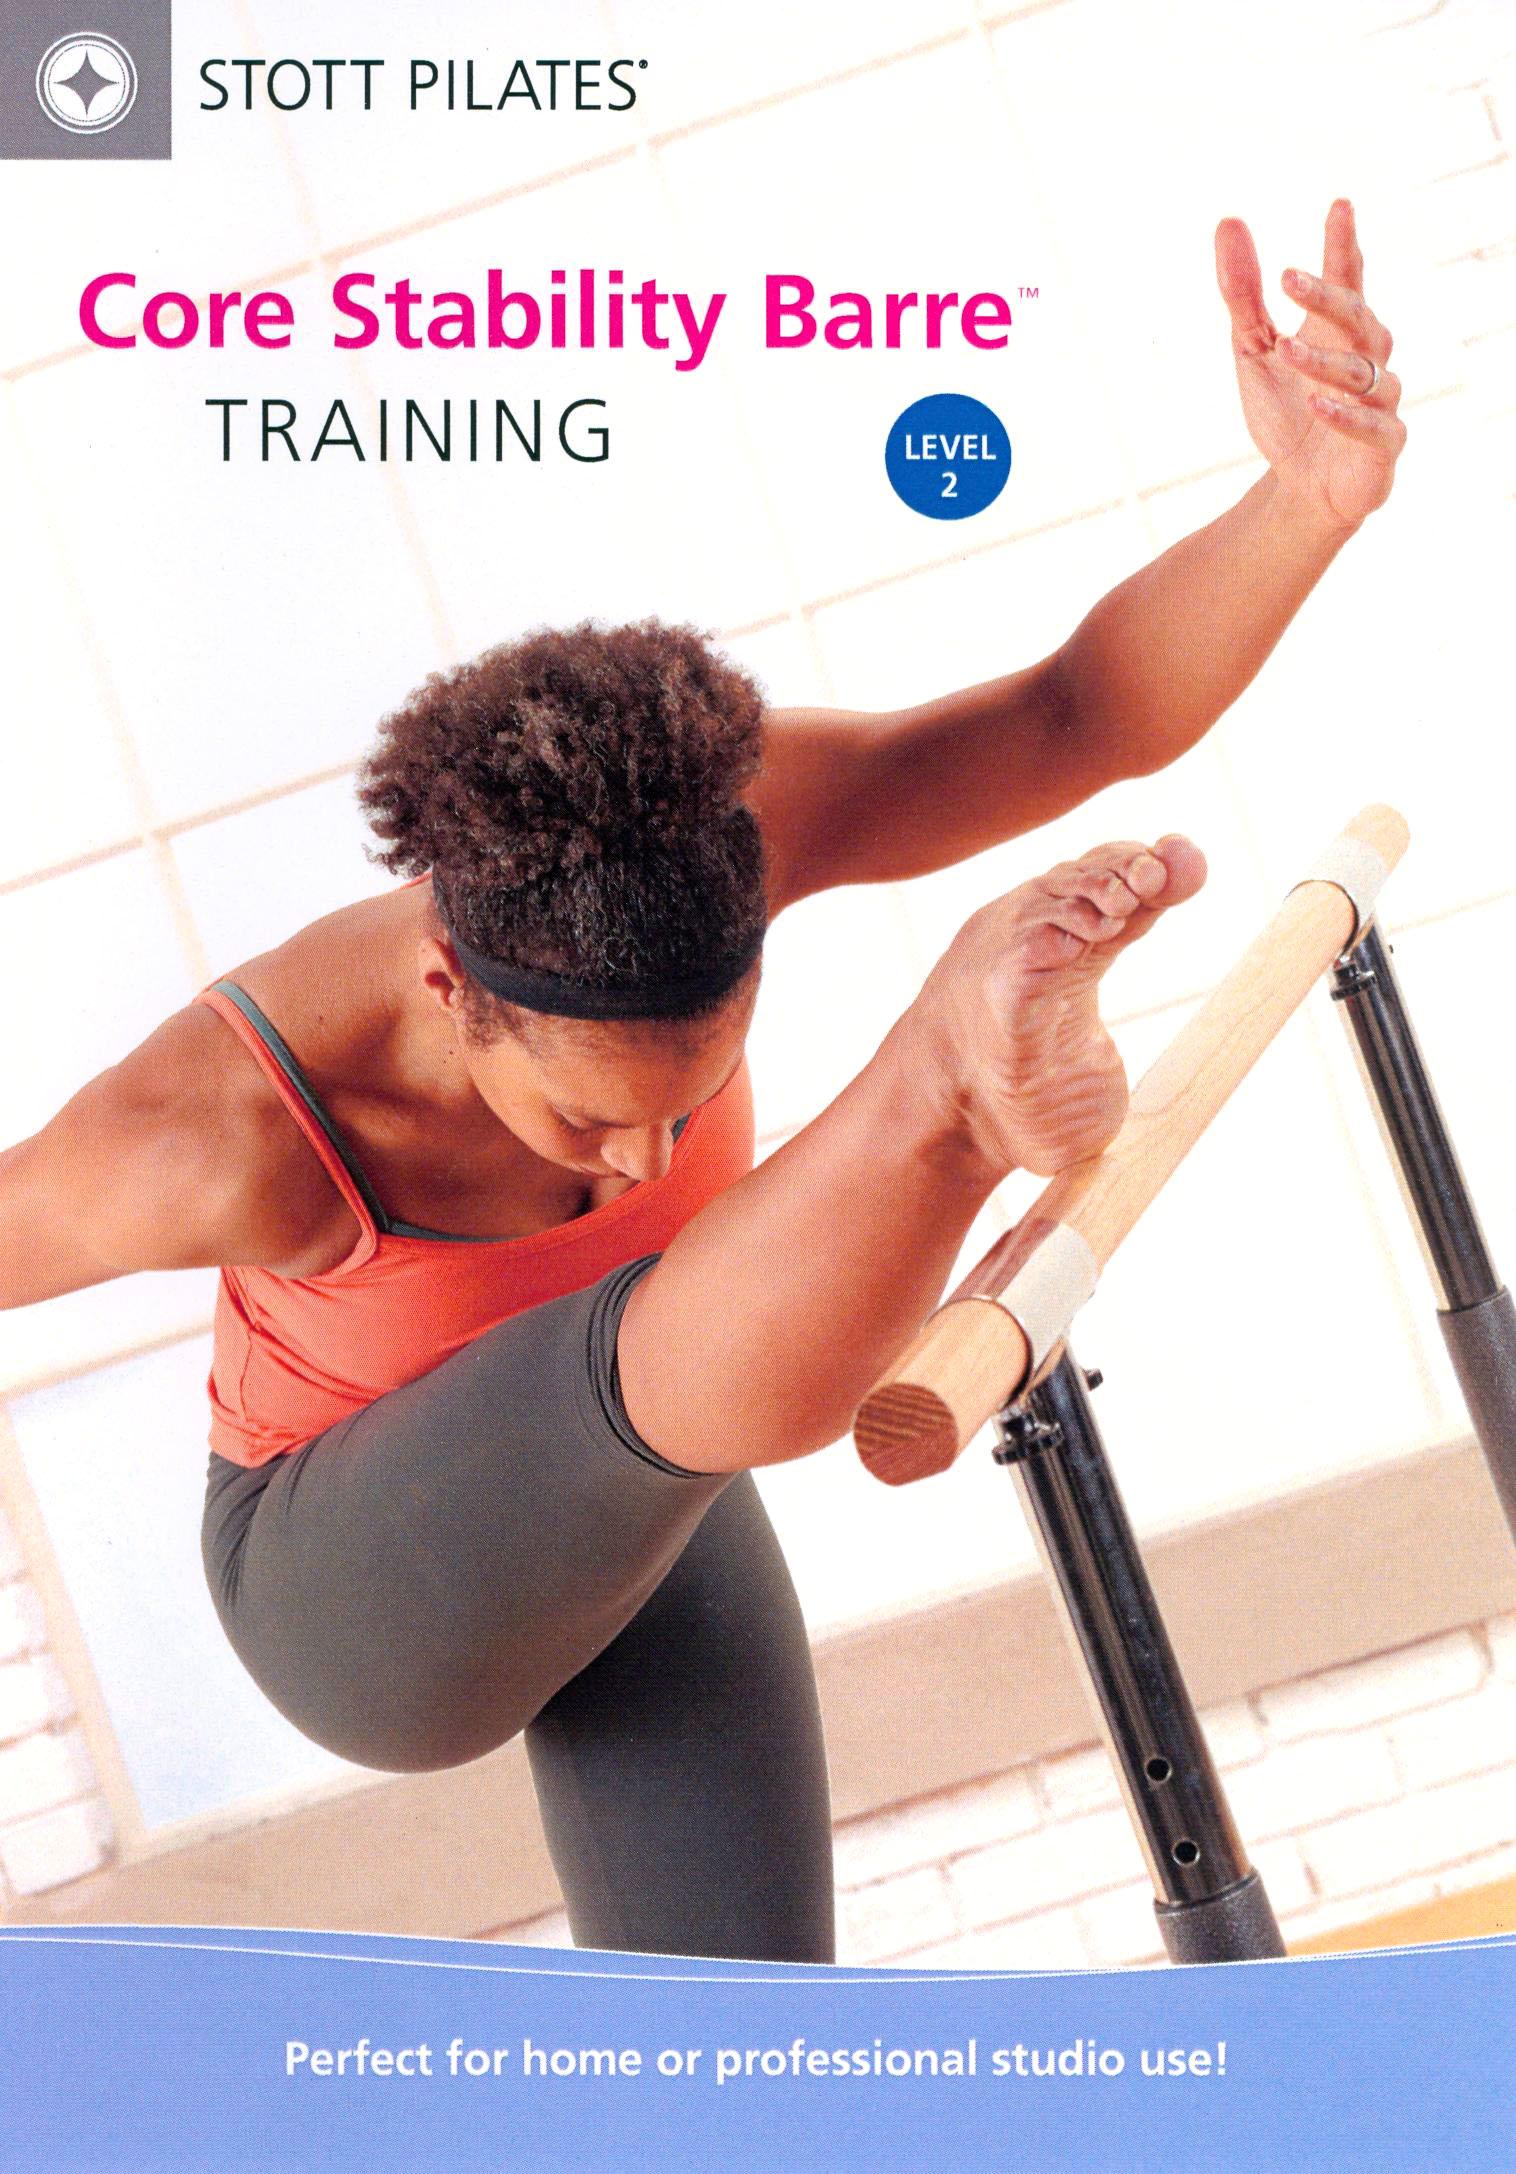 Stott Pilates: Core Stability Barre Training - Level 2